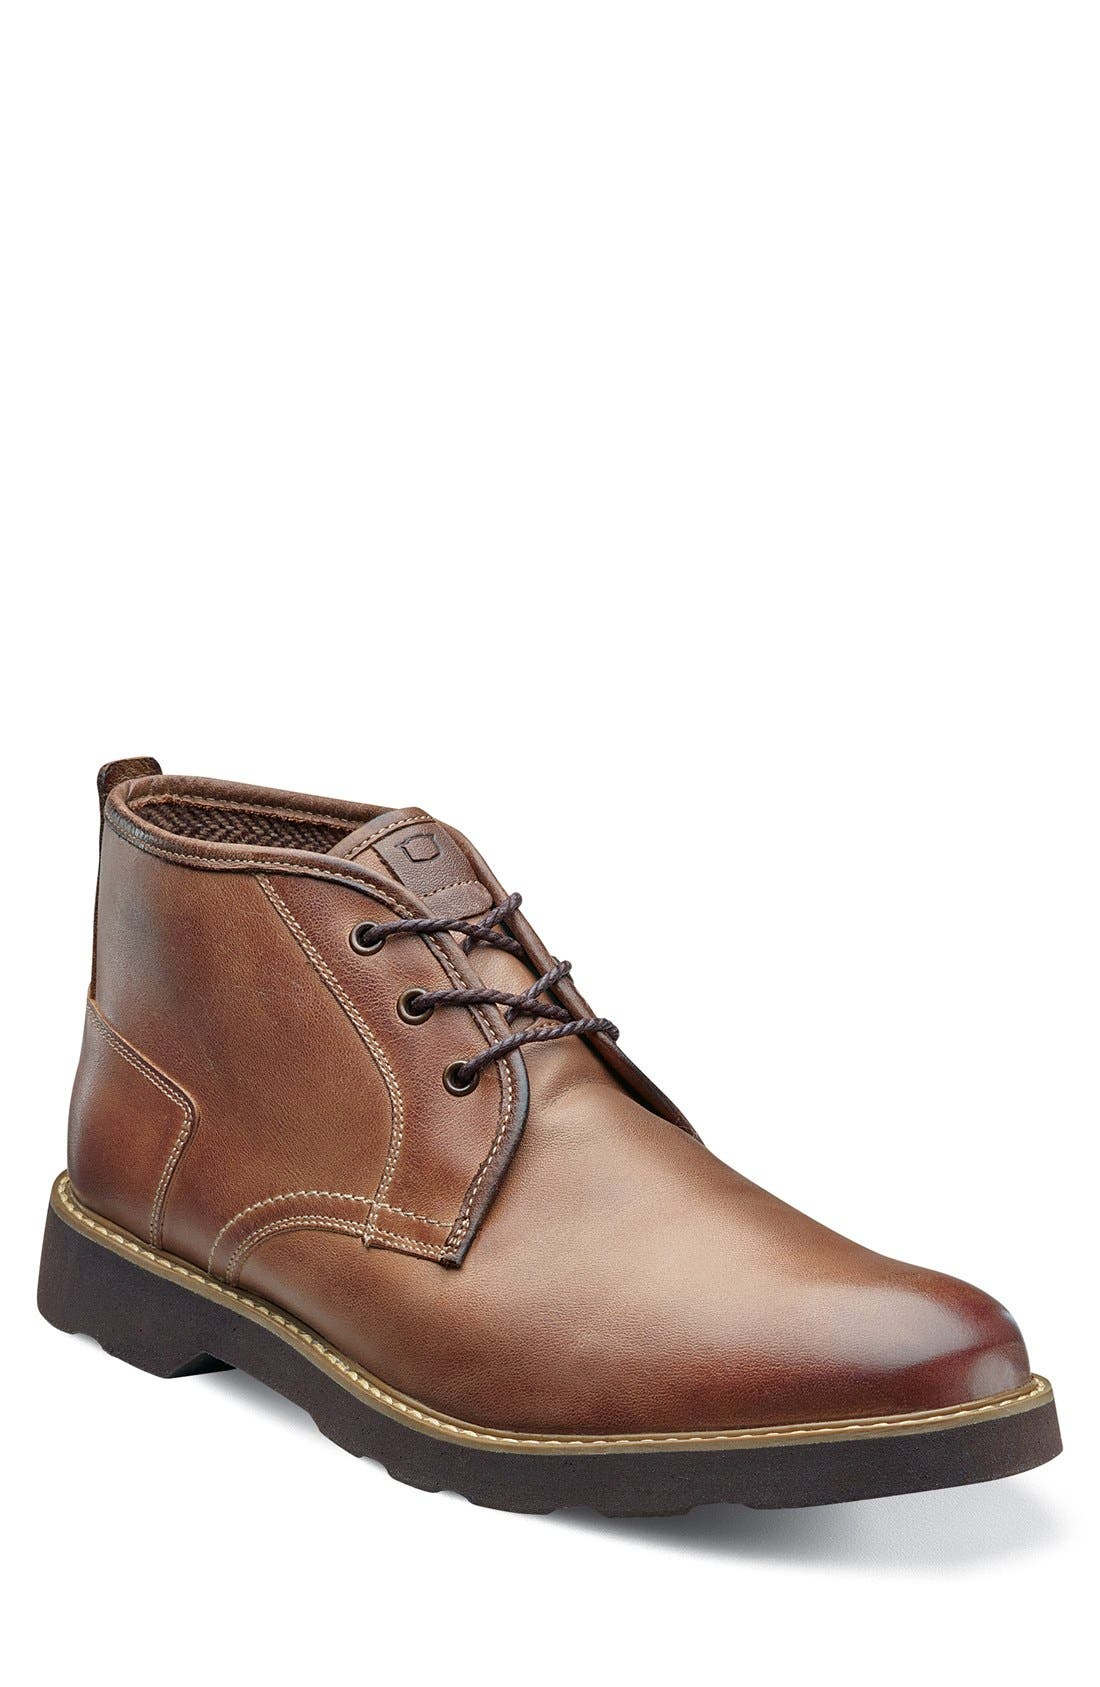 Alternate Image 1 Selected - Florsheim 'Casey' Chukka Boot (Men)